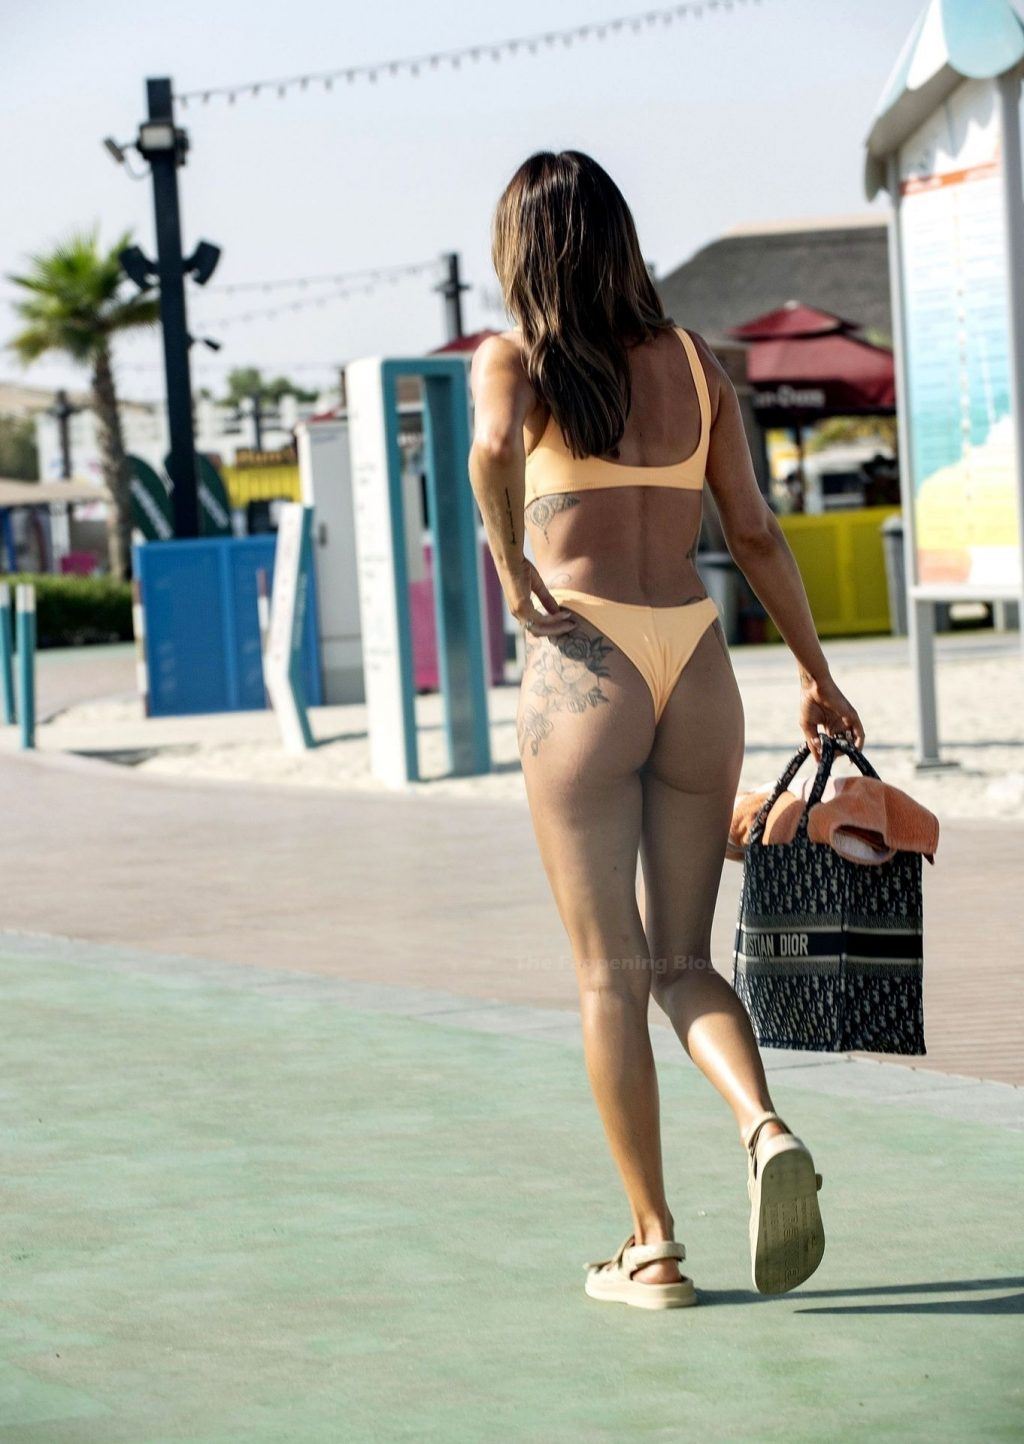 Laura Anderson Looks Stunning in an Orange Bikini on Holiday in Dubai (11 Photos)